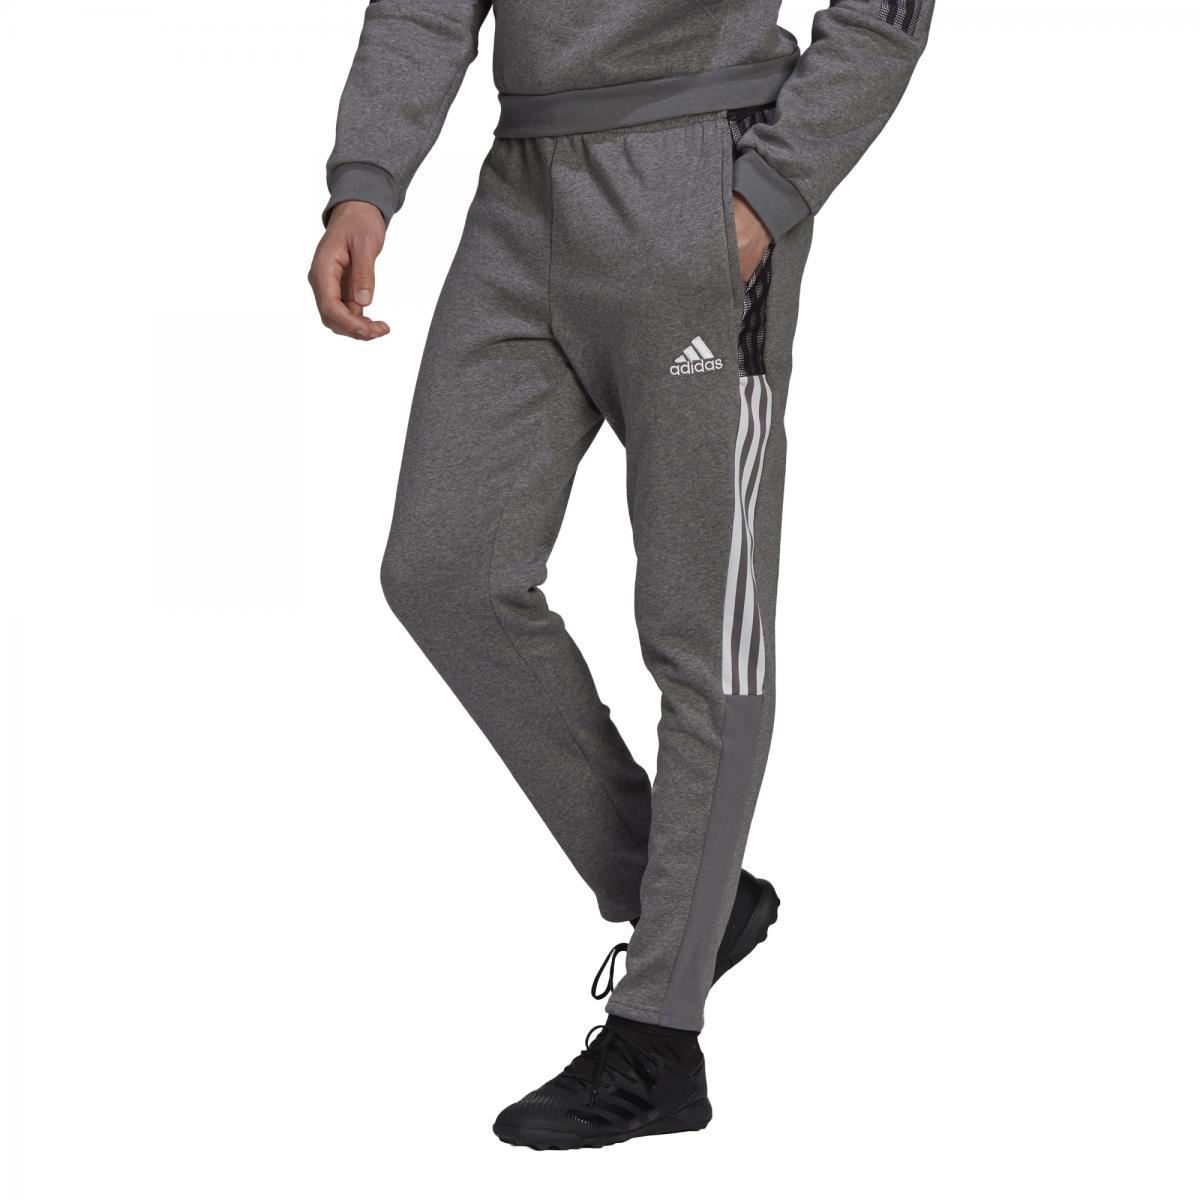 Adidas  Tiro21 Sweat Pant